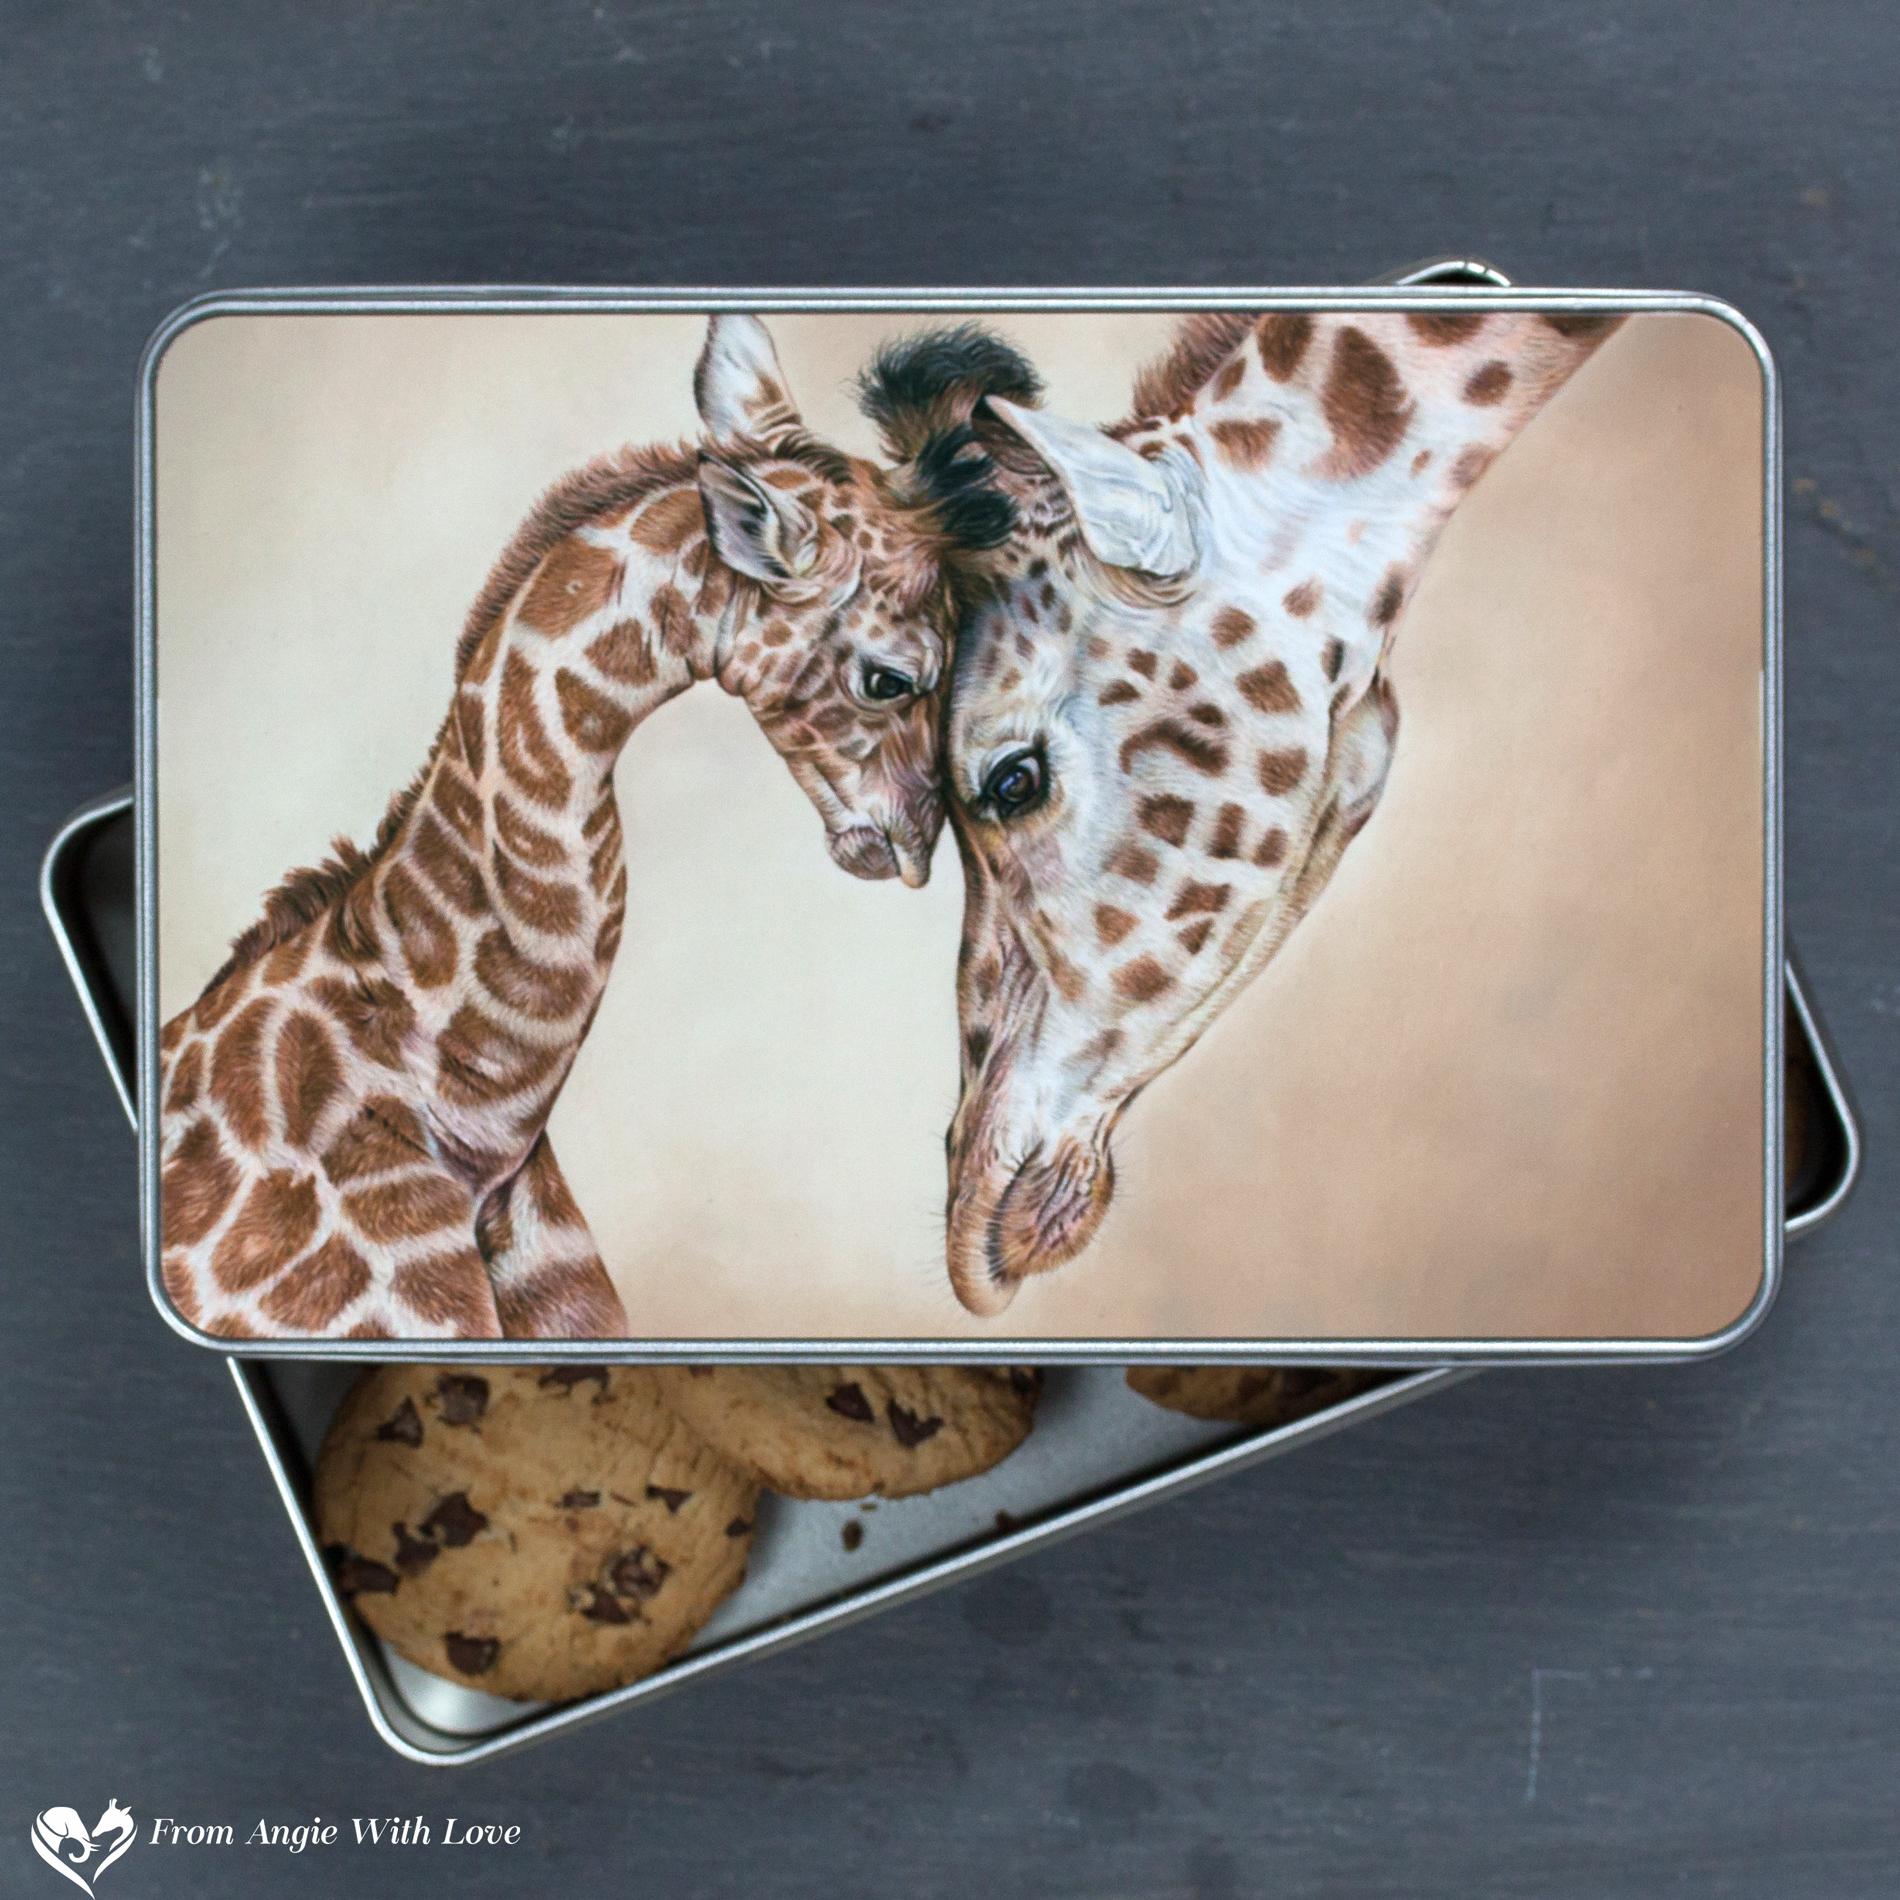 Giraffe Biscuit Tin - Tenderness